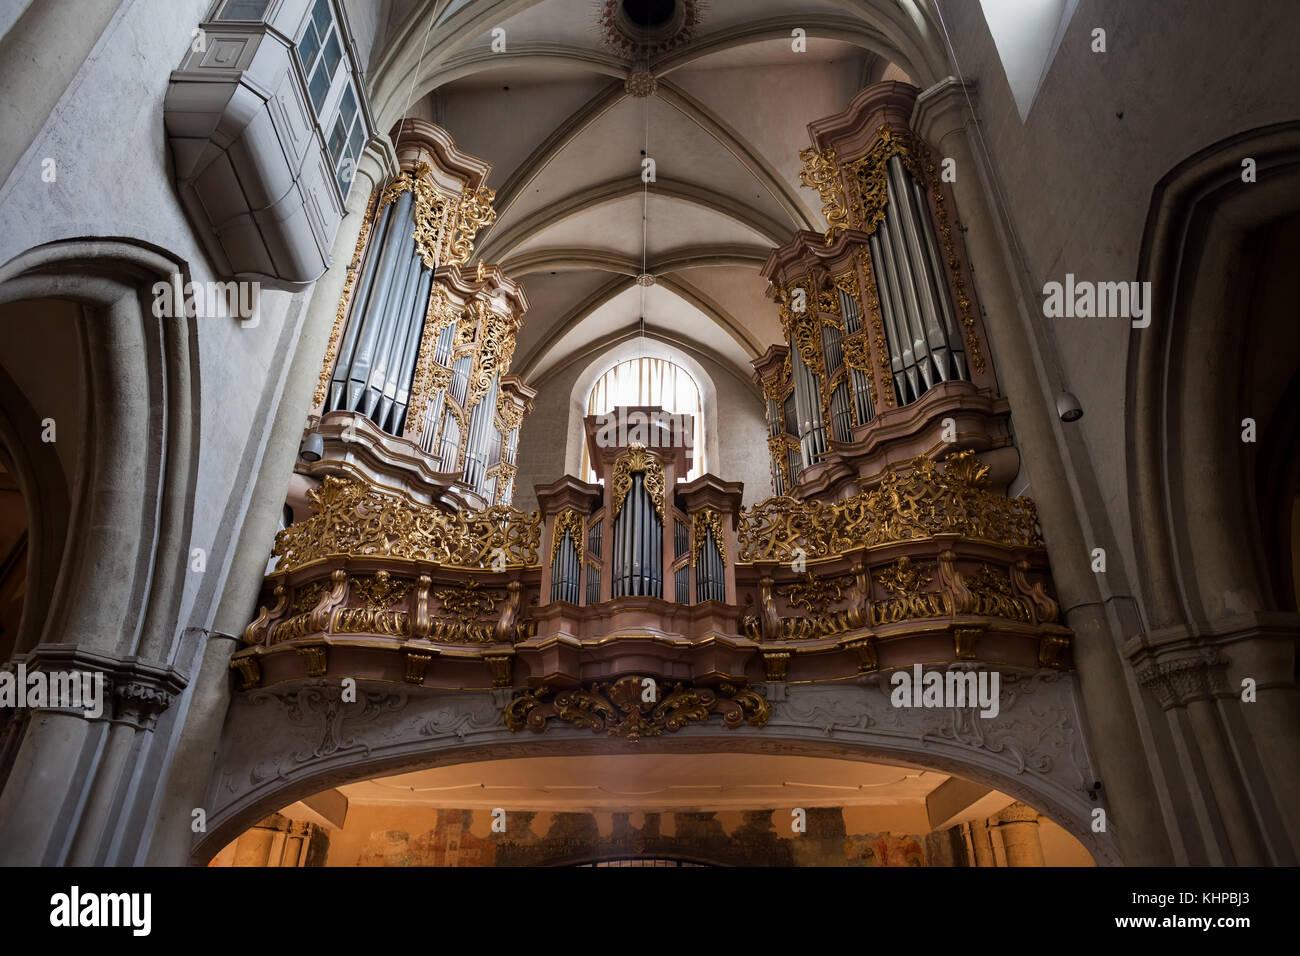 St. Michael's Church (German: Michaelerkirche) interior in Vienna, Austria, gilded pipe organ from 1714 by Johann - Stock Image